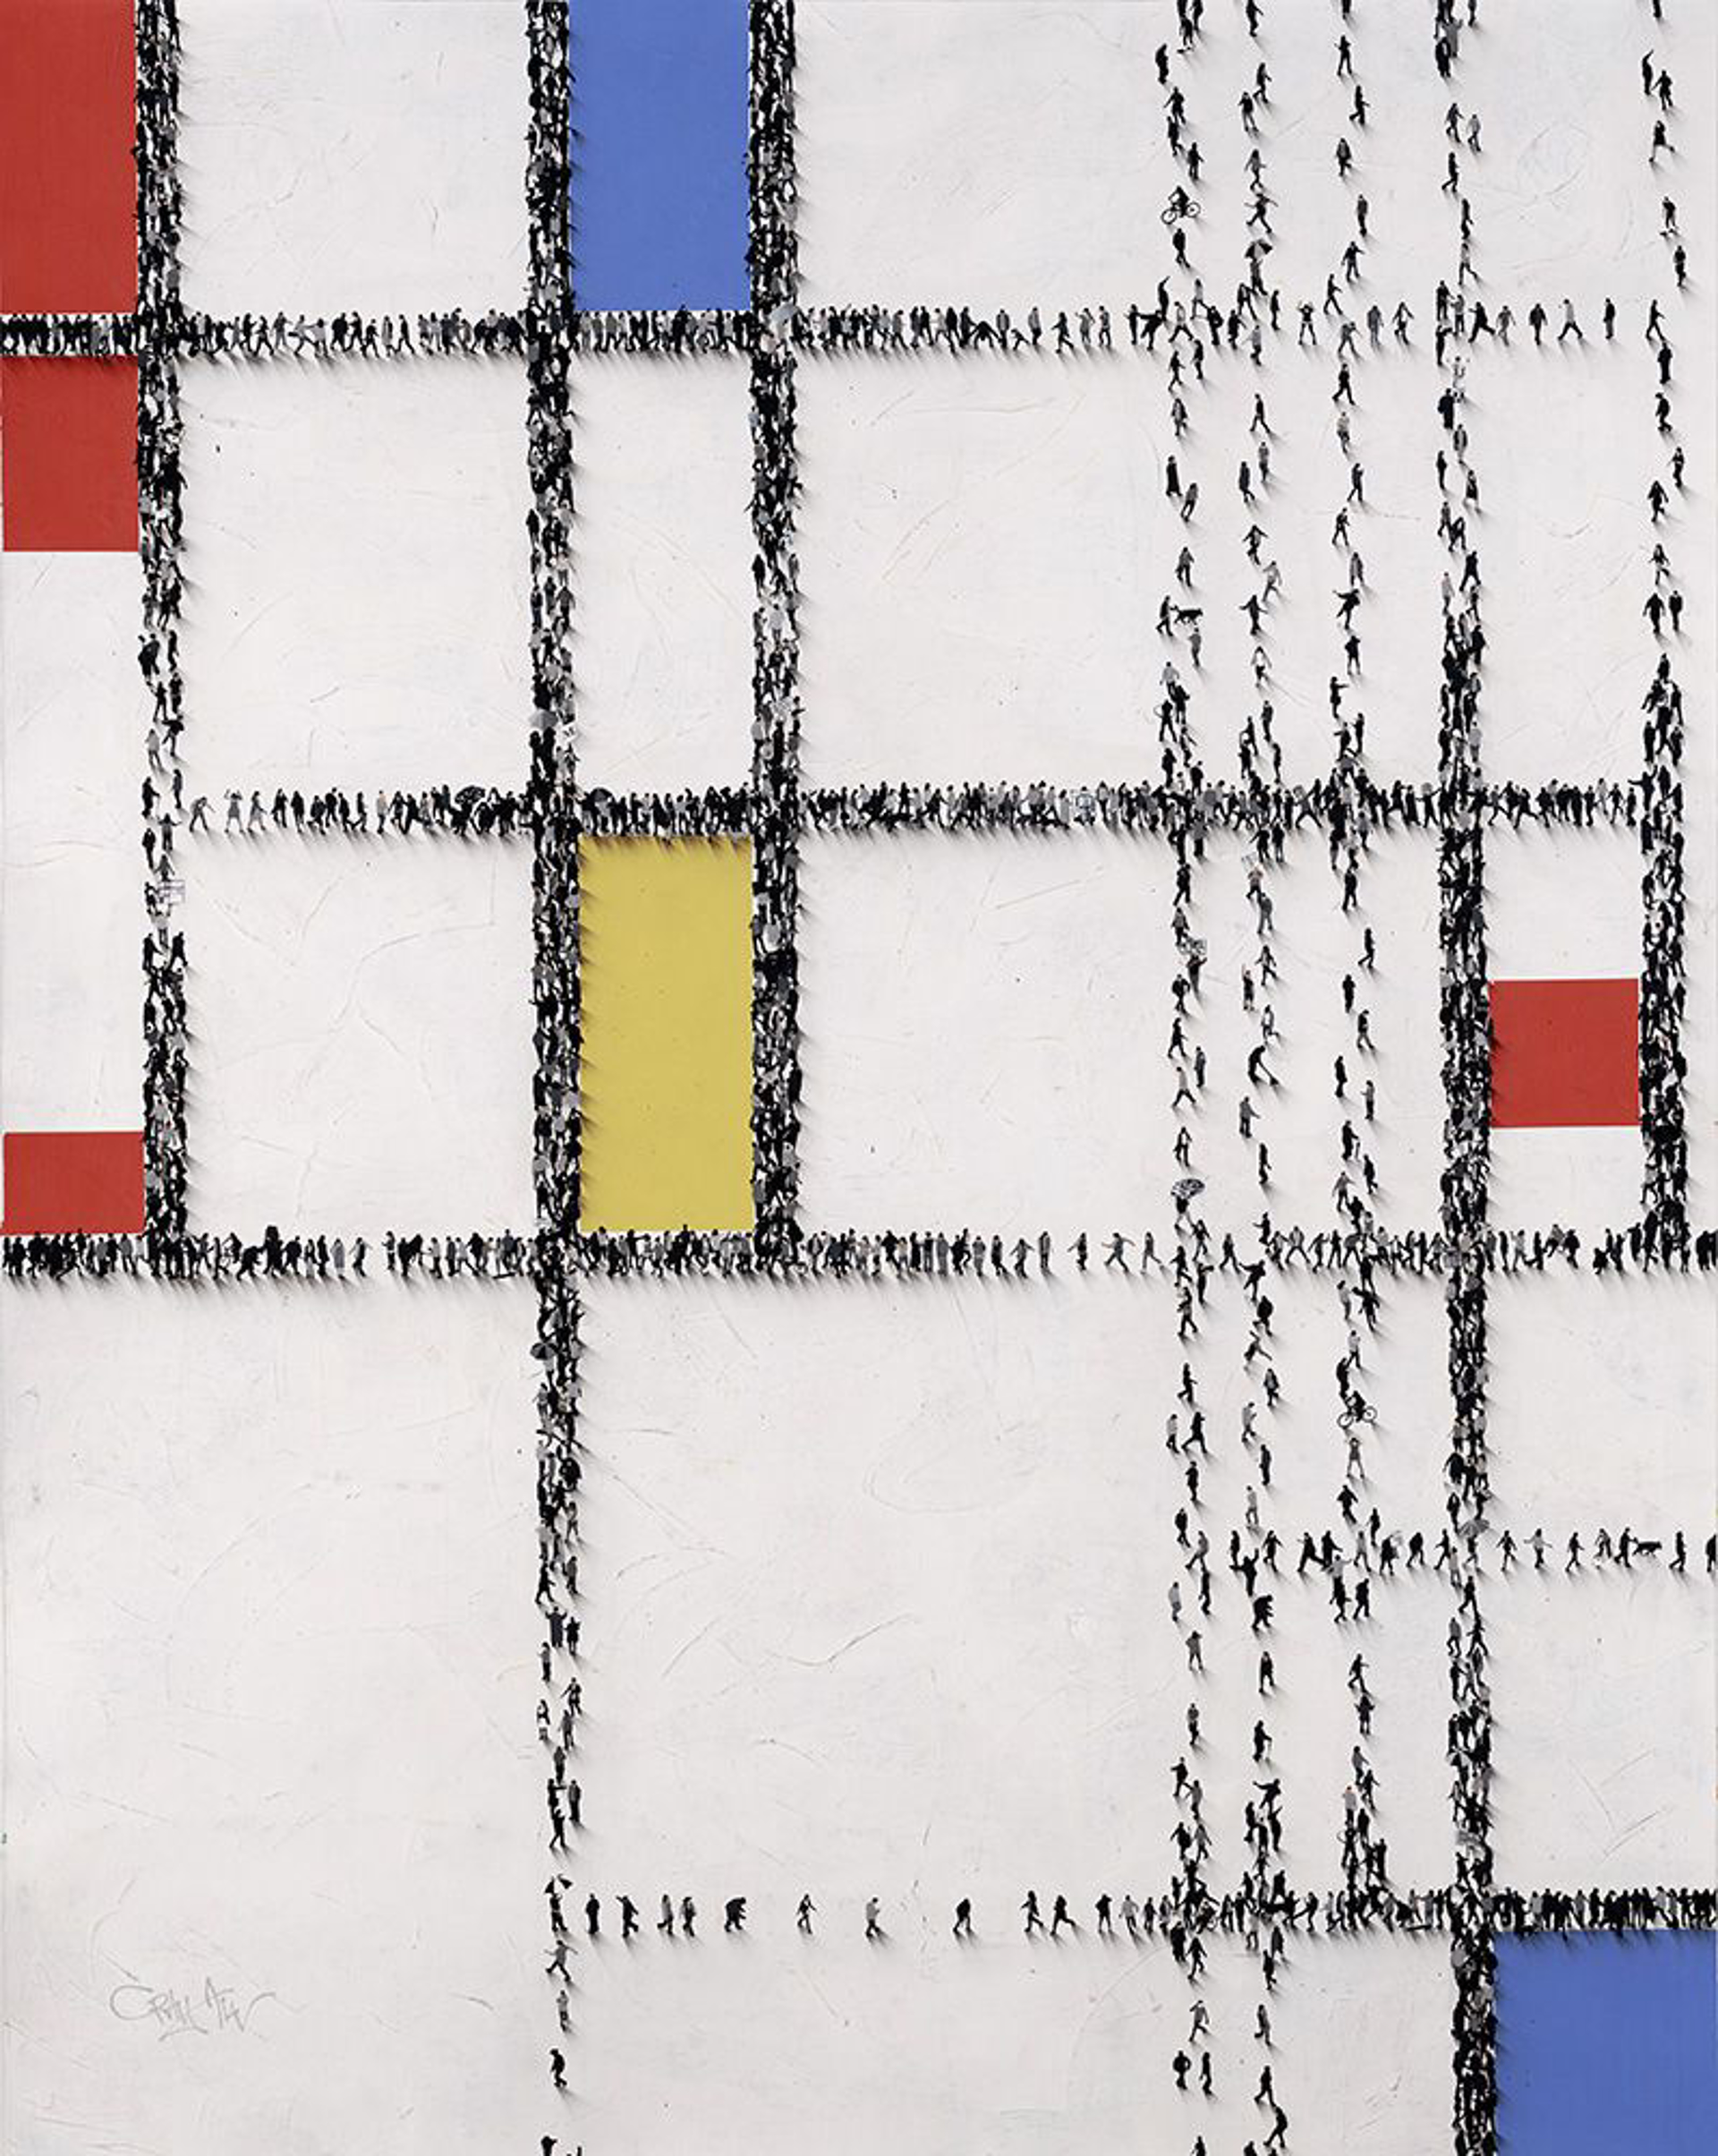 Gridlock (Sold) by Craig Alan, Populus Homage